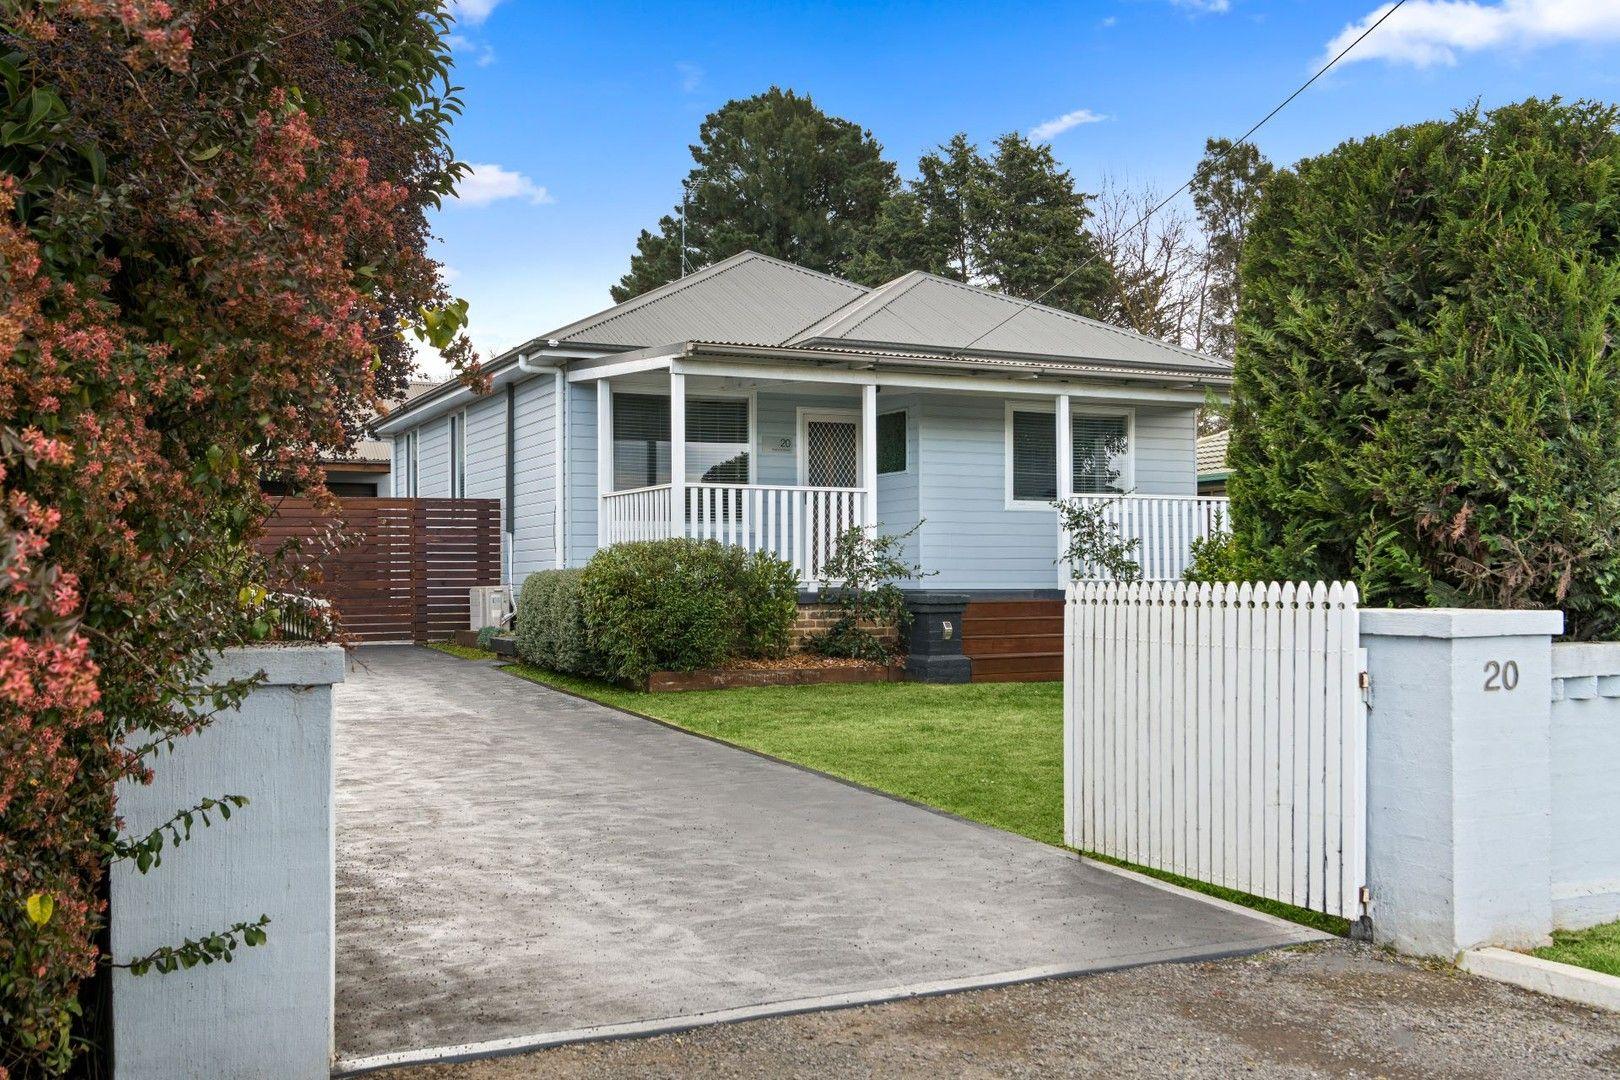 20 Brisbane Street, New Berrima NSW 2577, Image 0